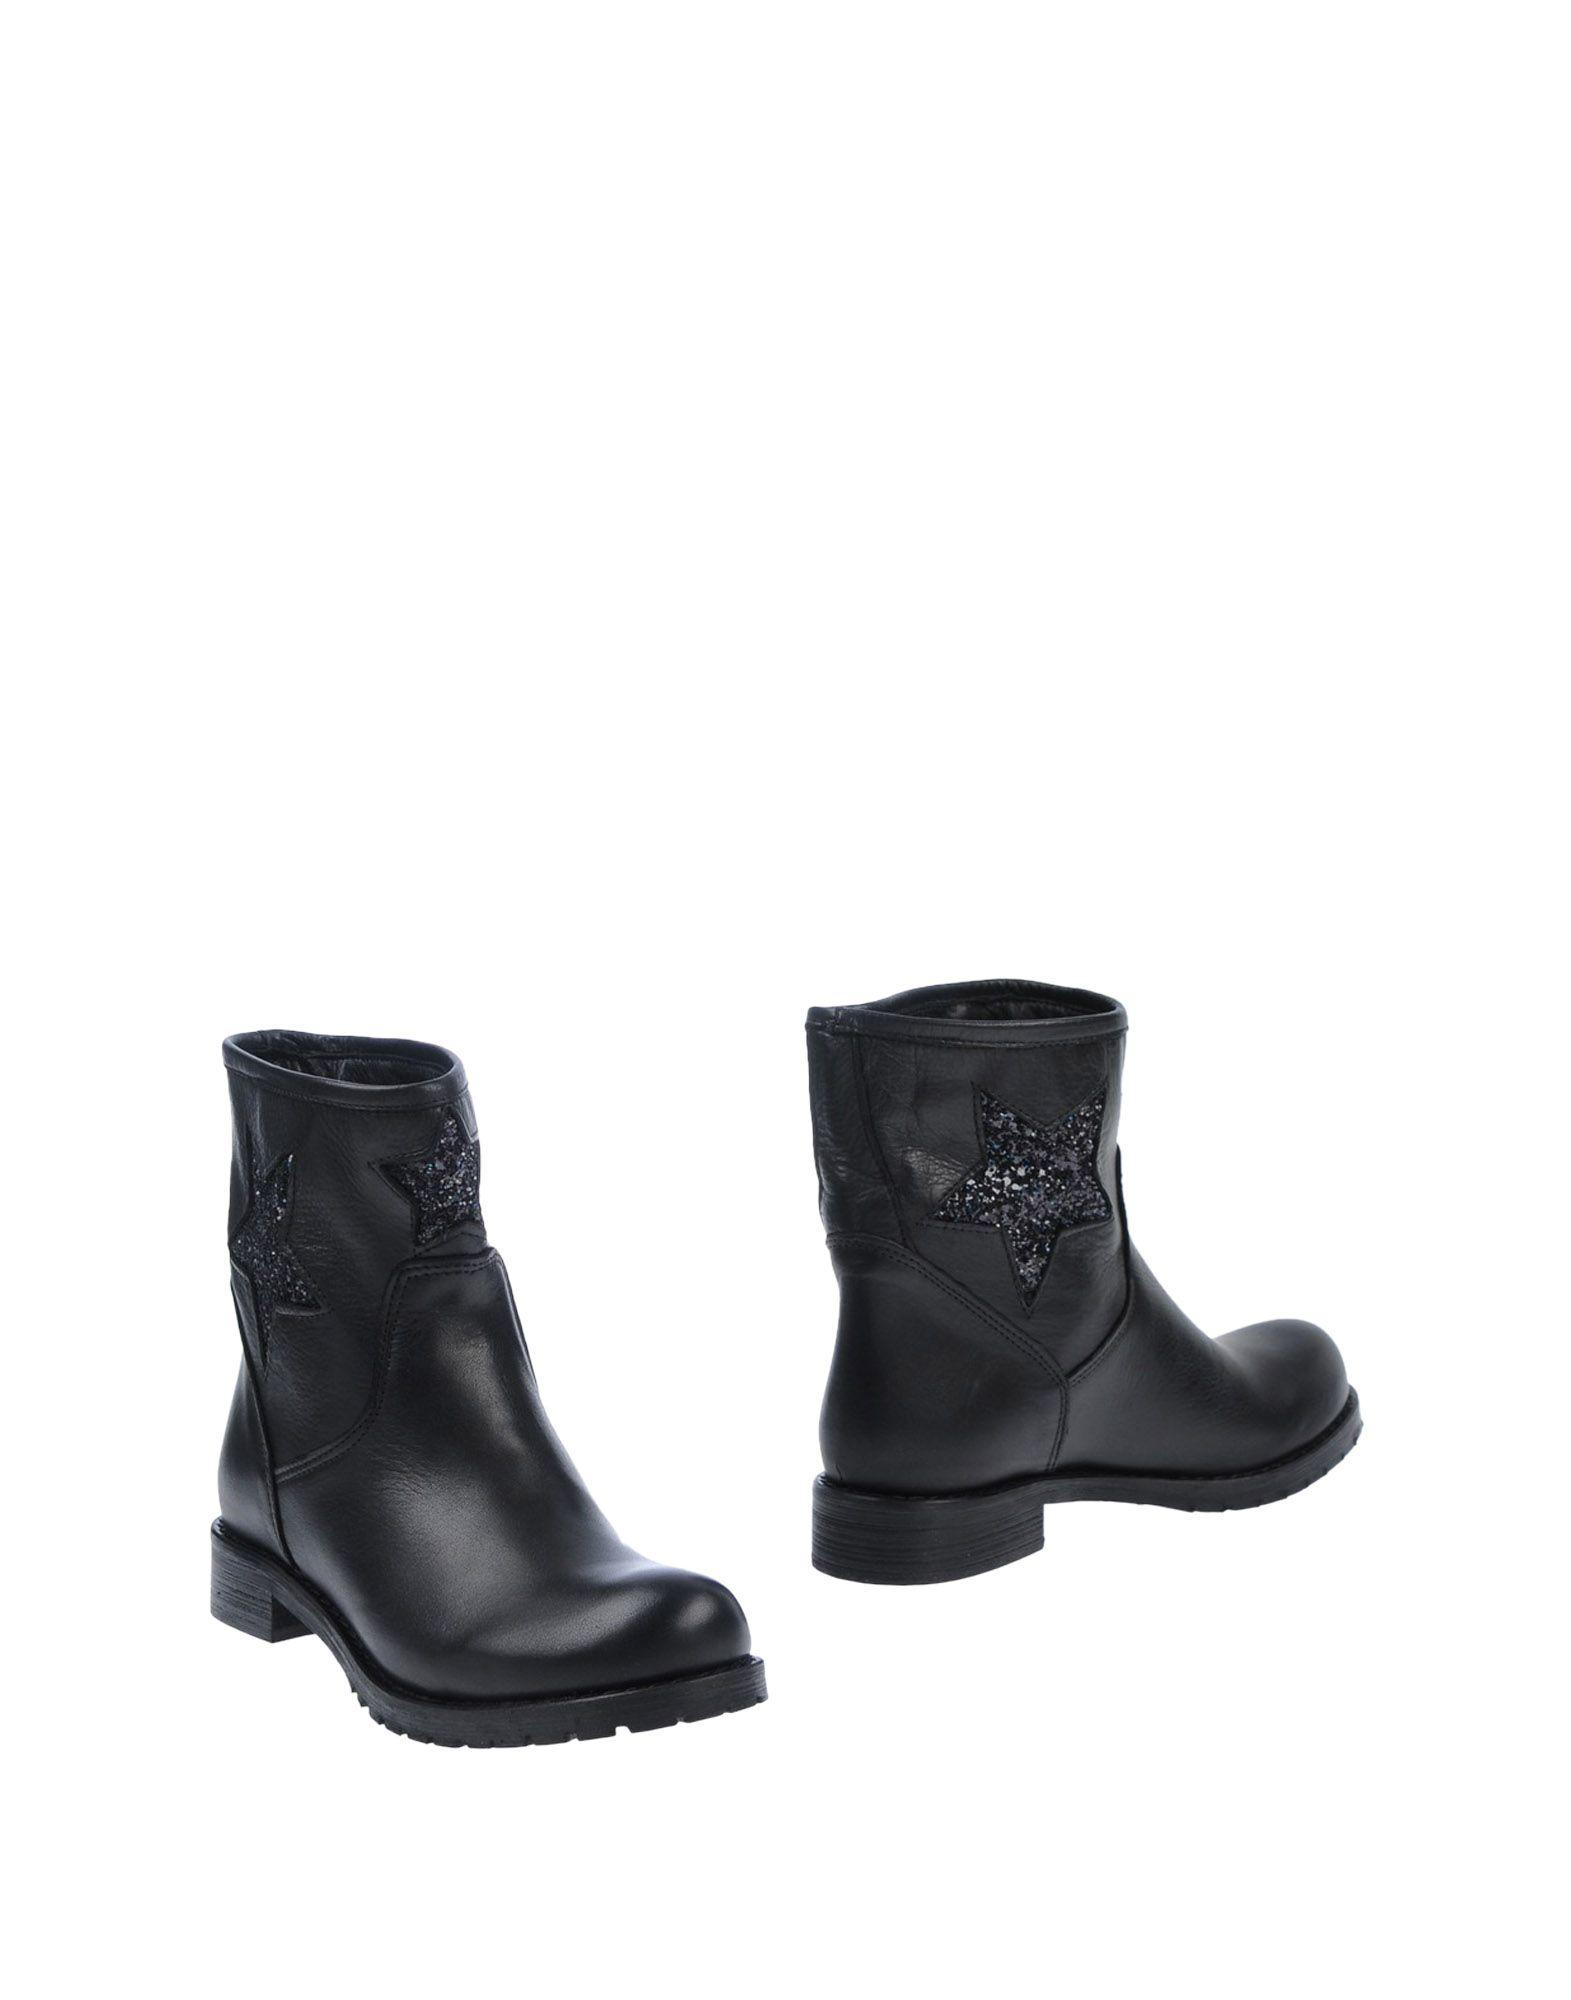 Mauro Schuhe Fedeli Stiefelette Damen  11507353JK Gute Qualität beliebte Schuhe Mauro 29d54f